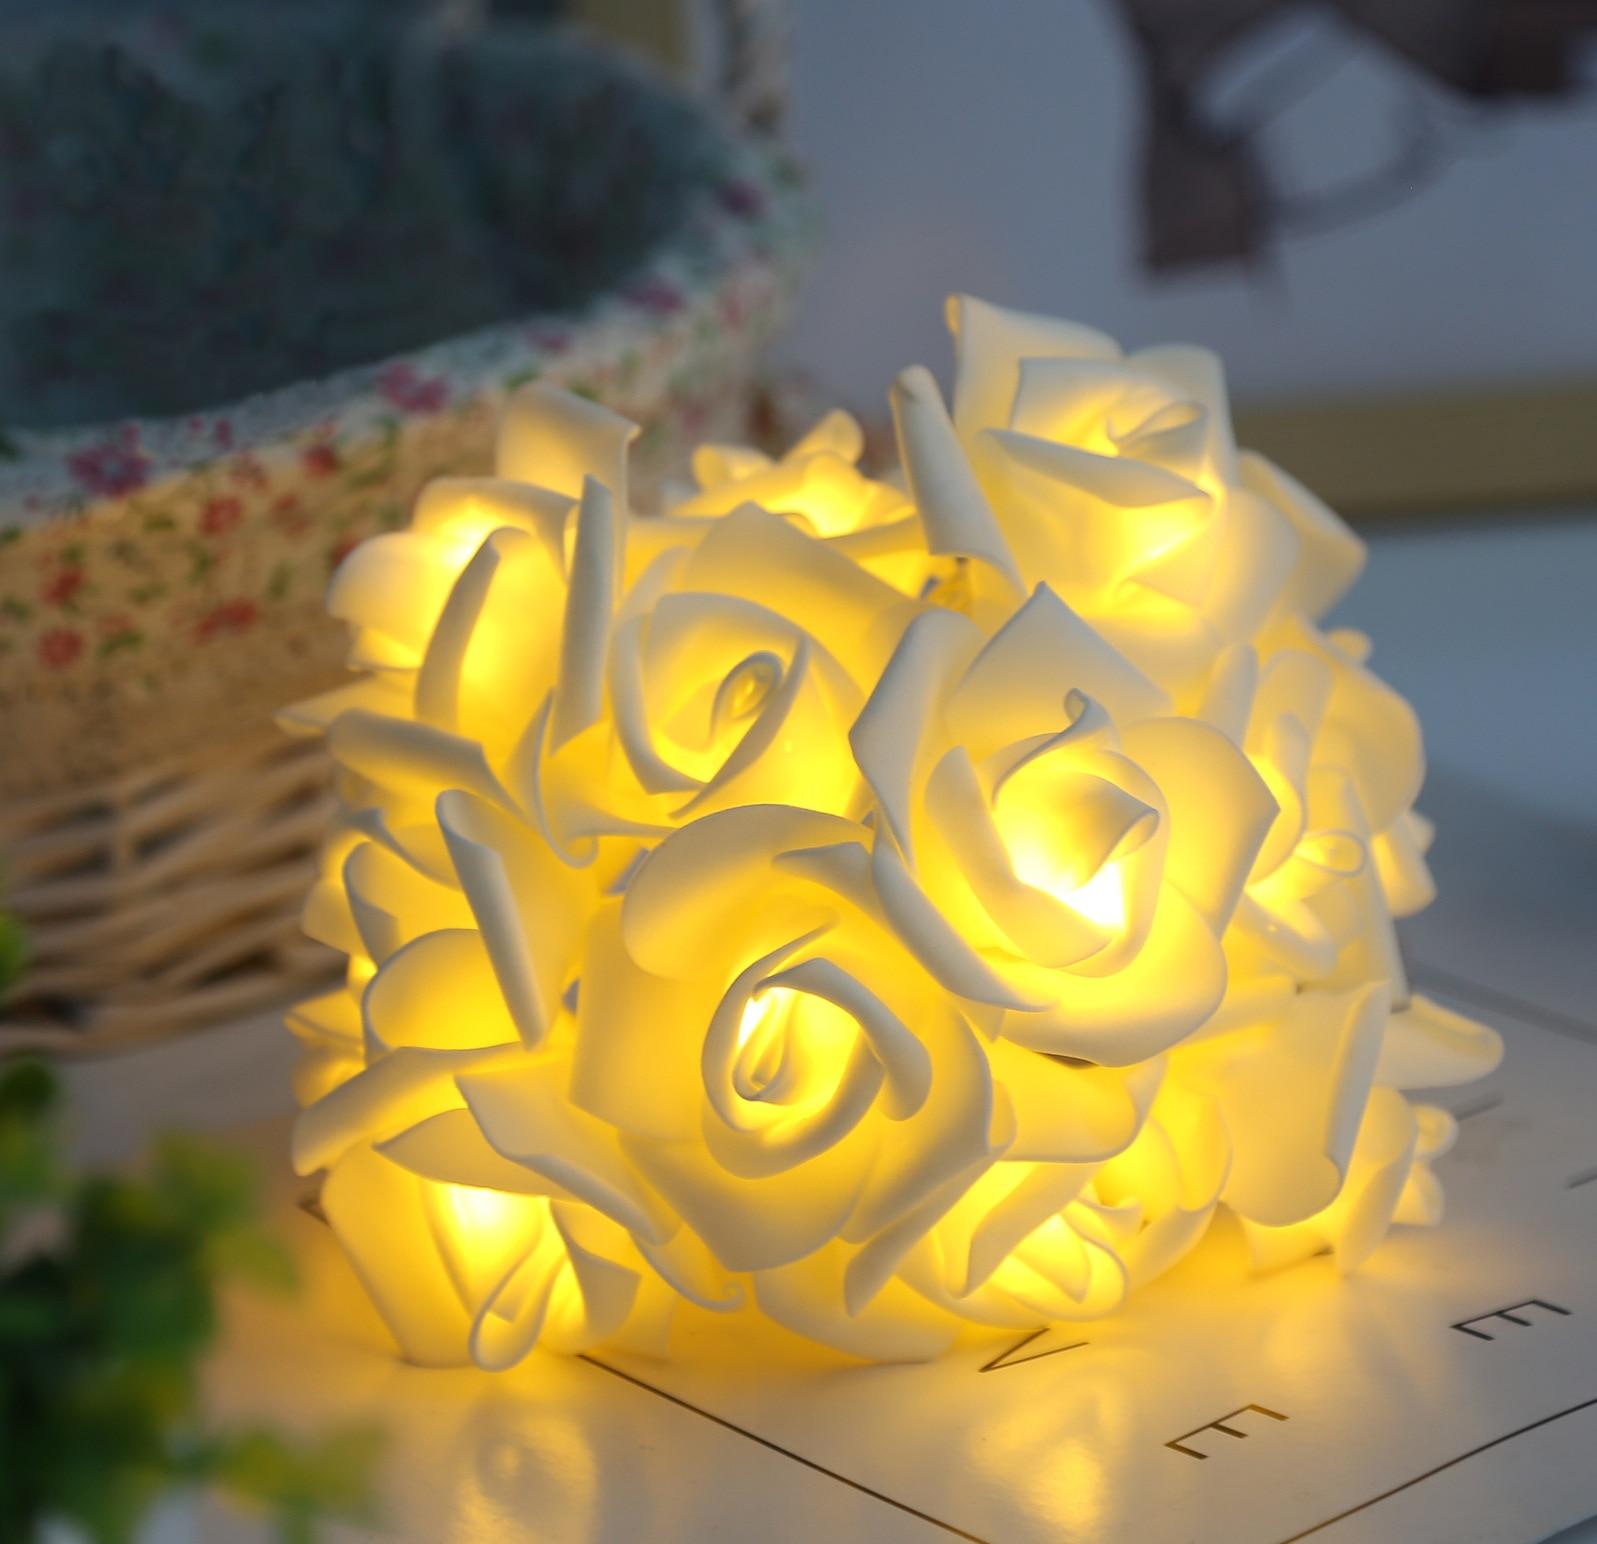 3M 5M 10M batería LED AA bola cadena luces Navidad luces interior LED Rosa flor en baterías boda Luz de decoración de Navidad